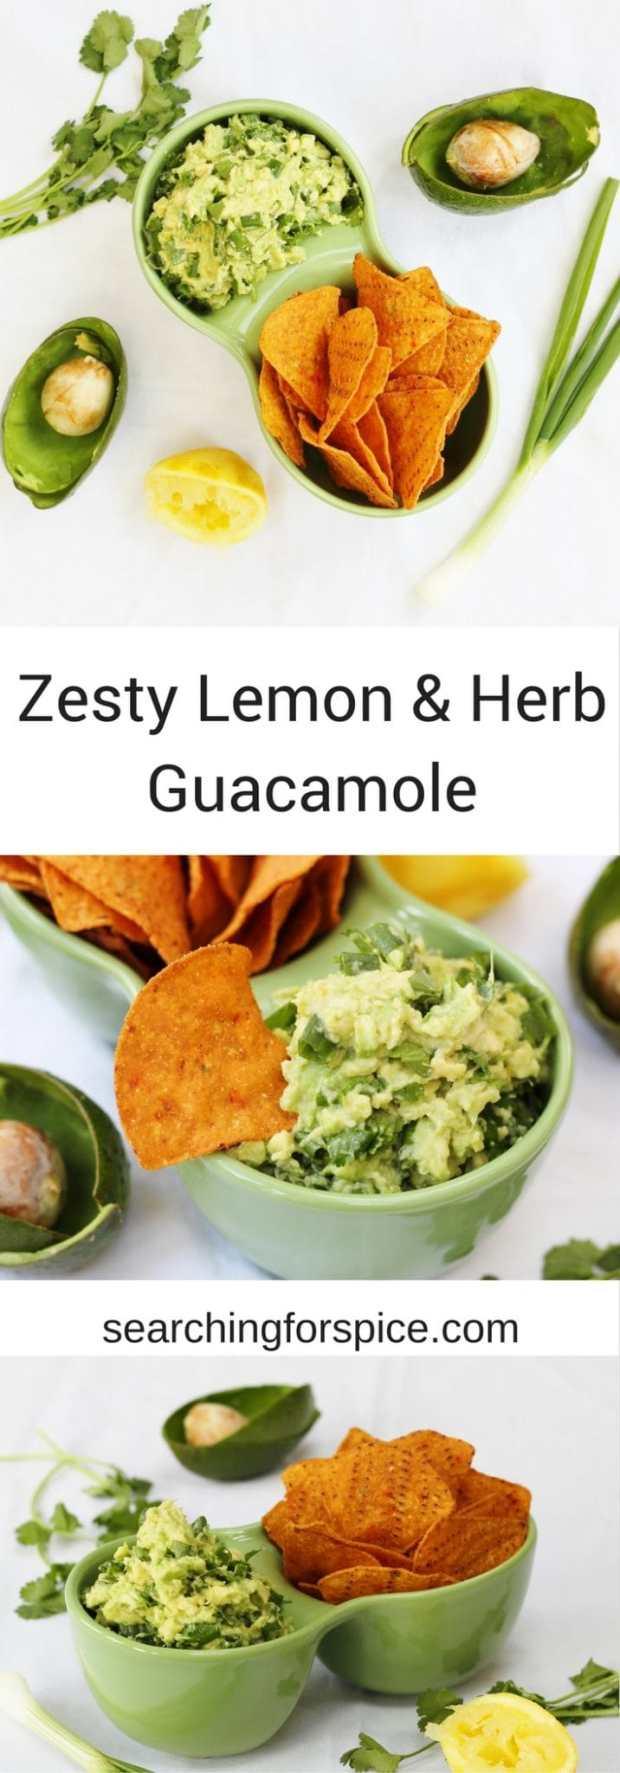 Recipe for zesty lemon and herb guacamole. Simple easy to make dip made with avocados, lemon, garlic and coriander (cilantro).